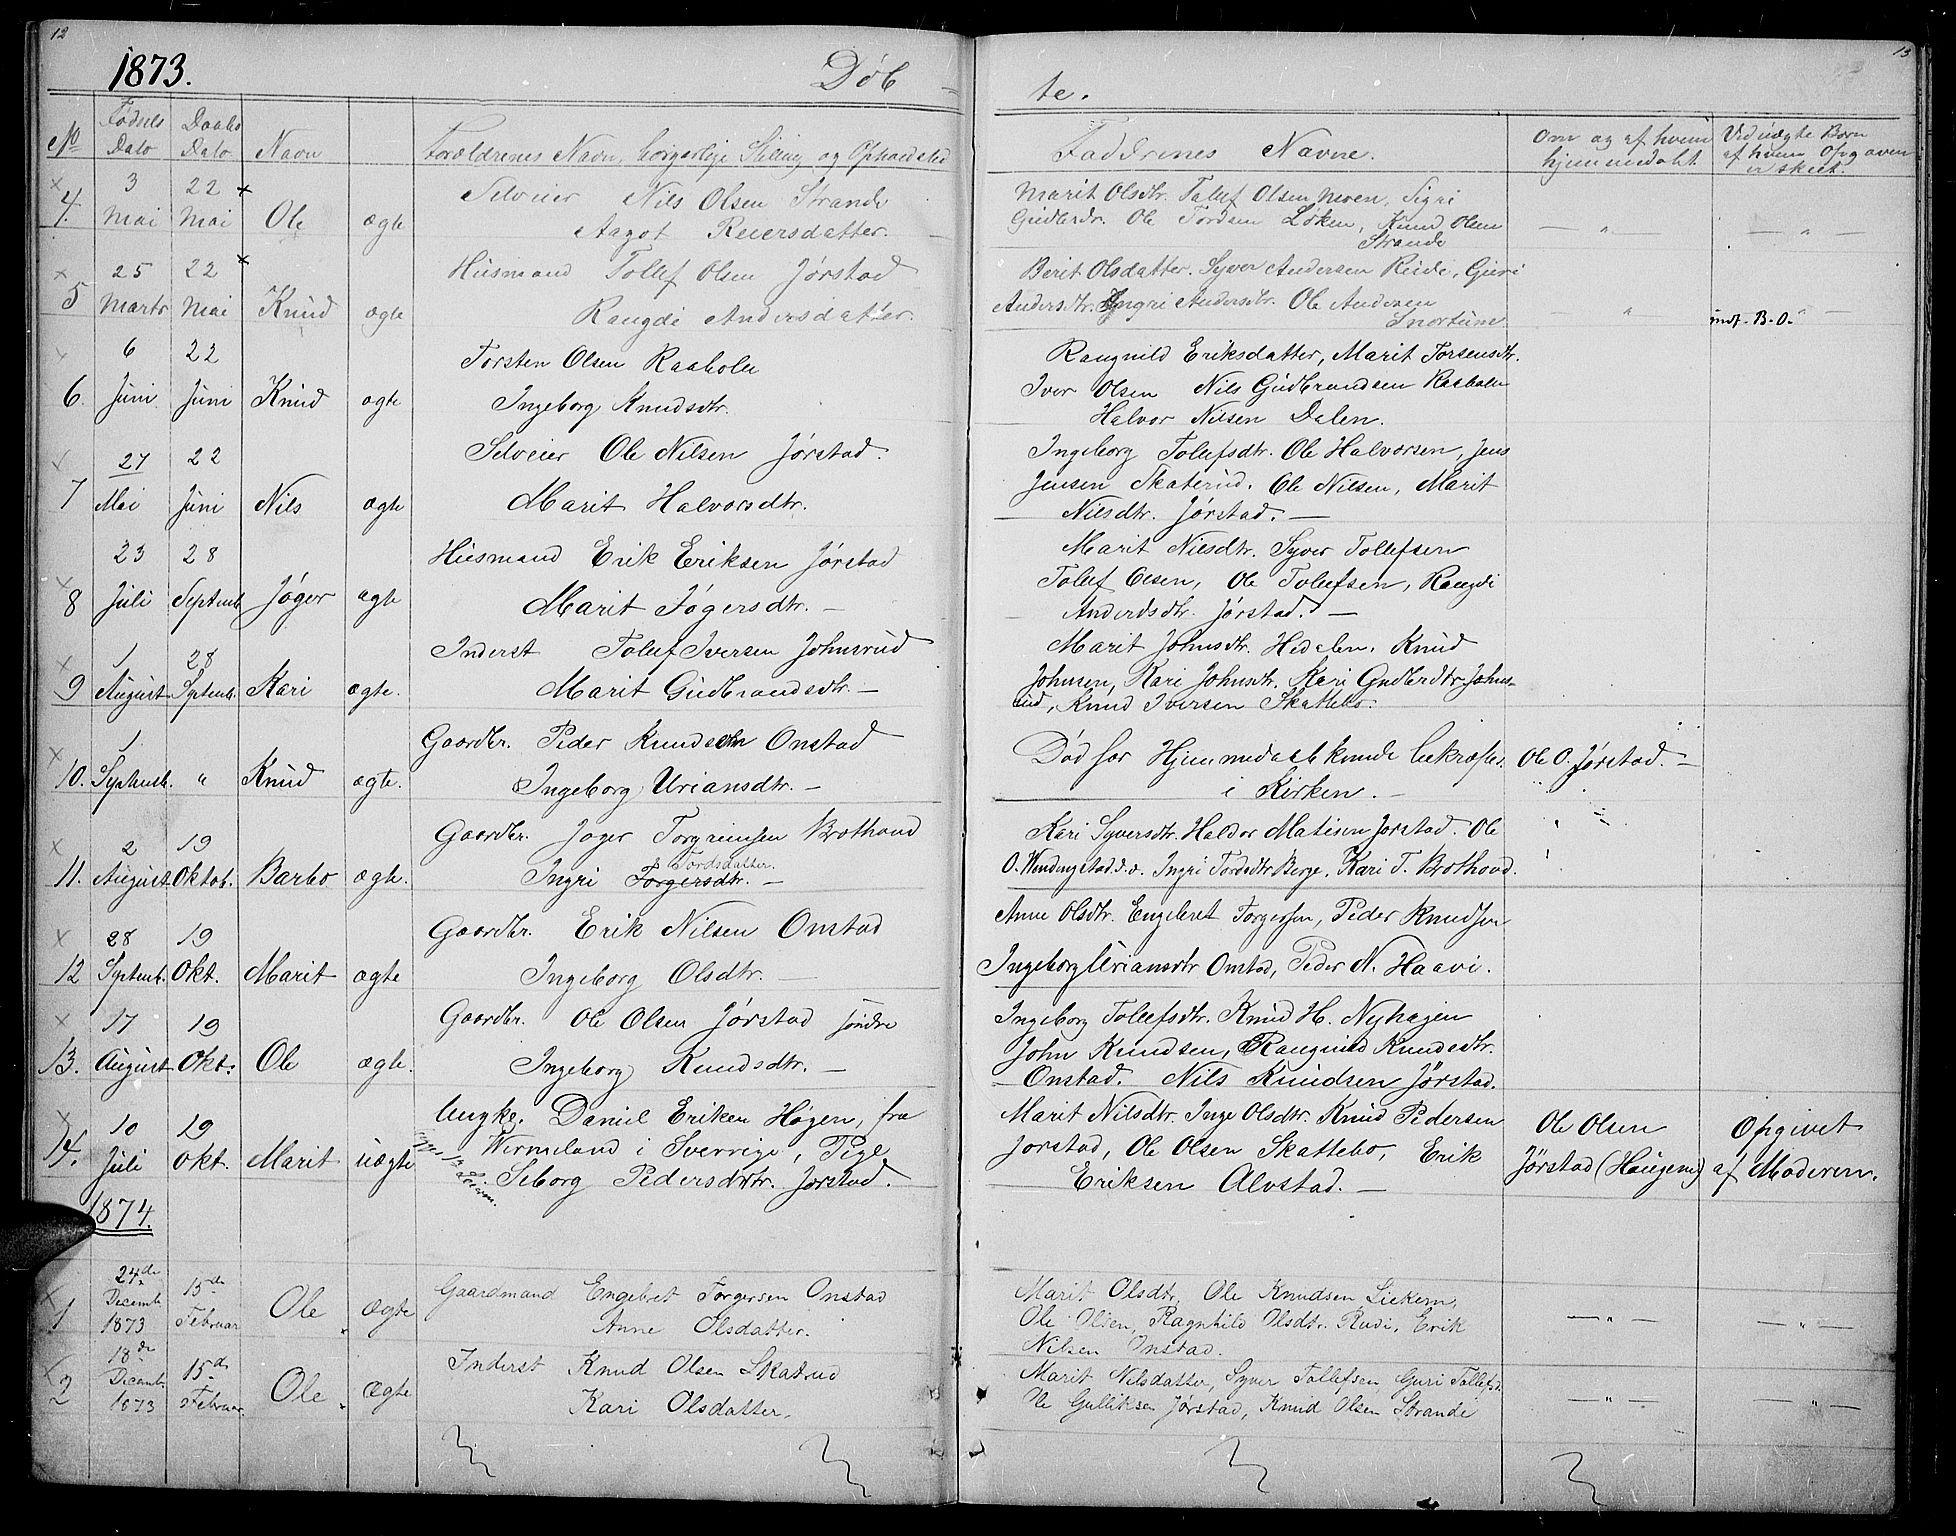 SAH, Øystre Slidre prestekontor, Klokkerbok nr. 2, 1866-1886, s. 12-13